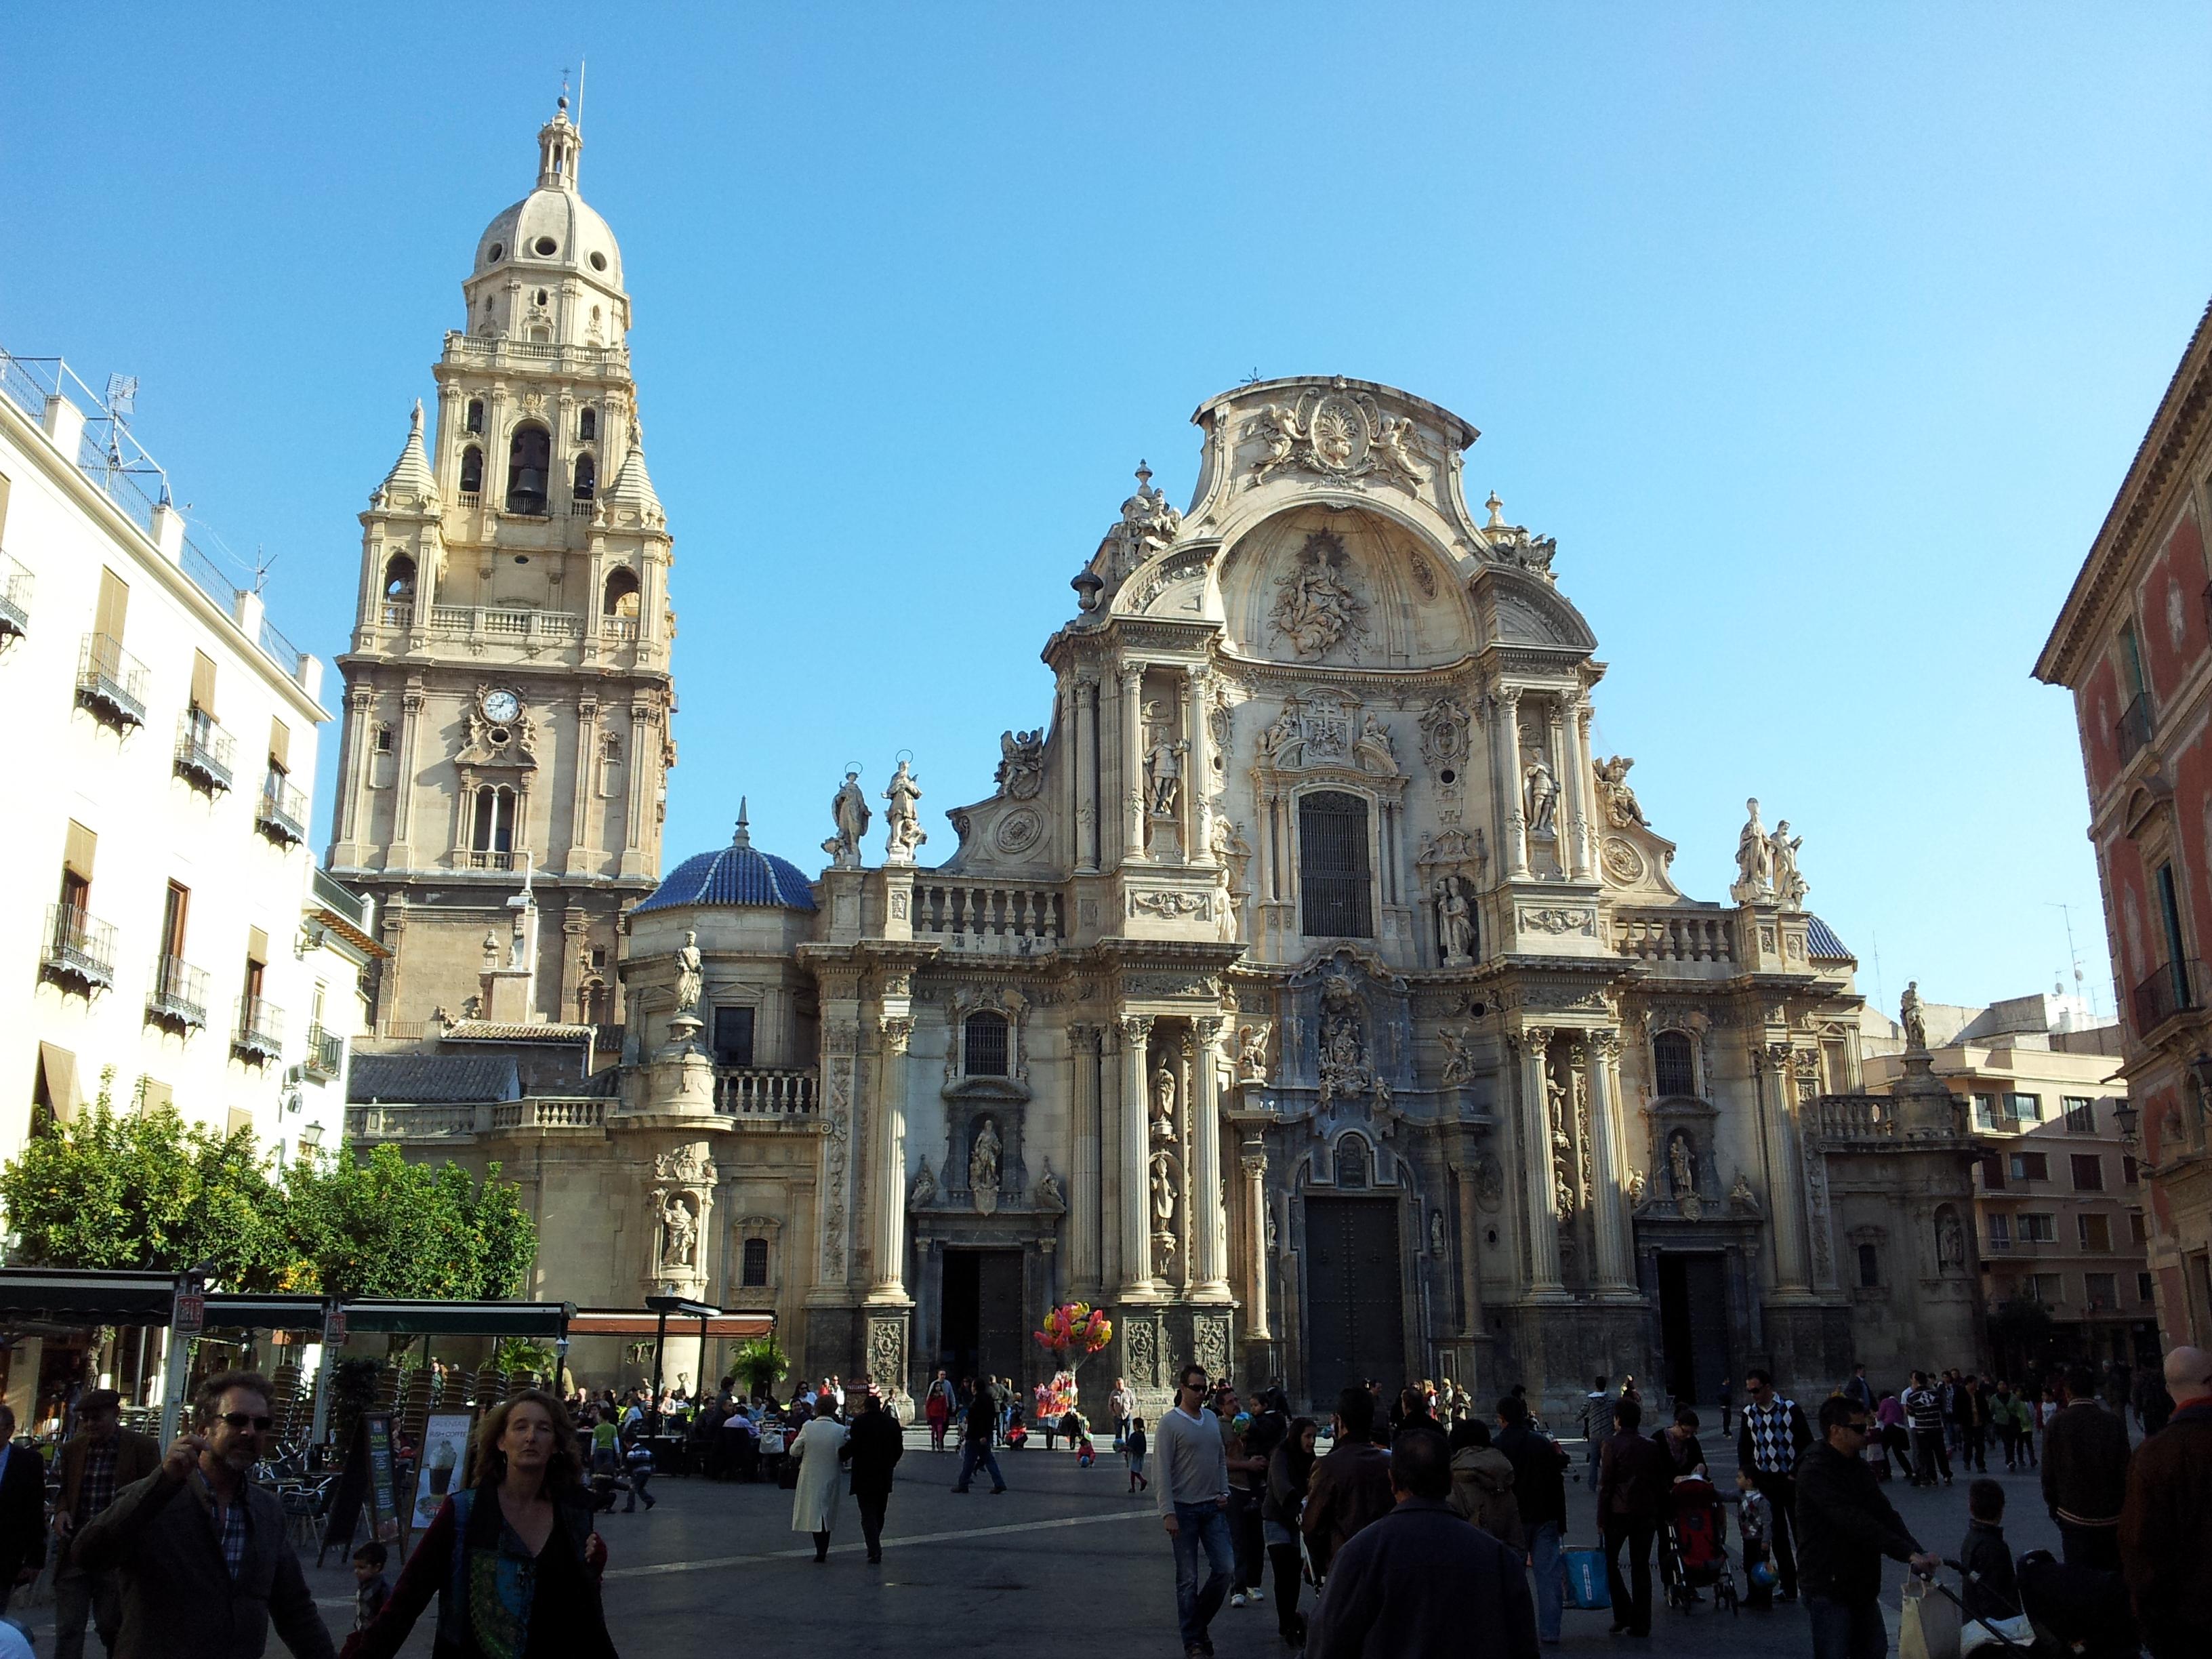 File:Catedral de Santa María, Murcia.jpg - Wikimedia Commons